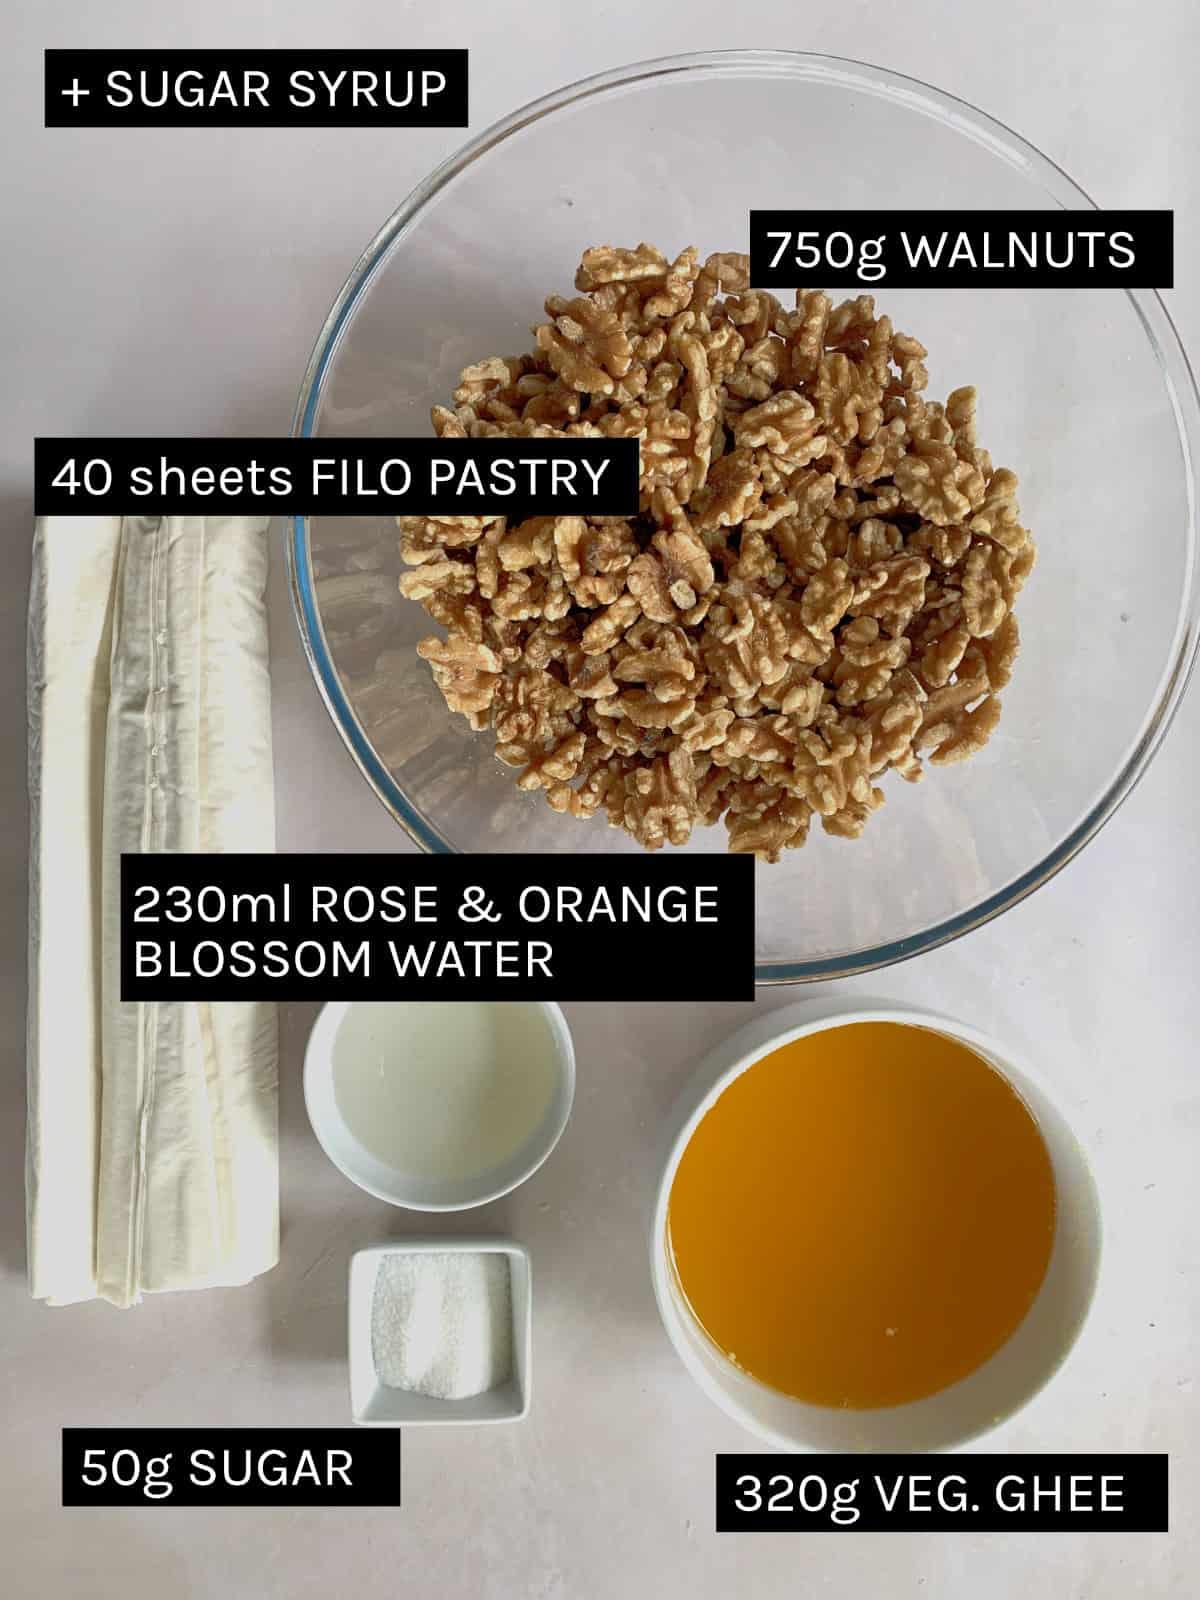 baklawa ingredients in a flat lay